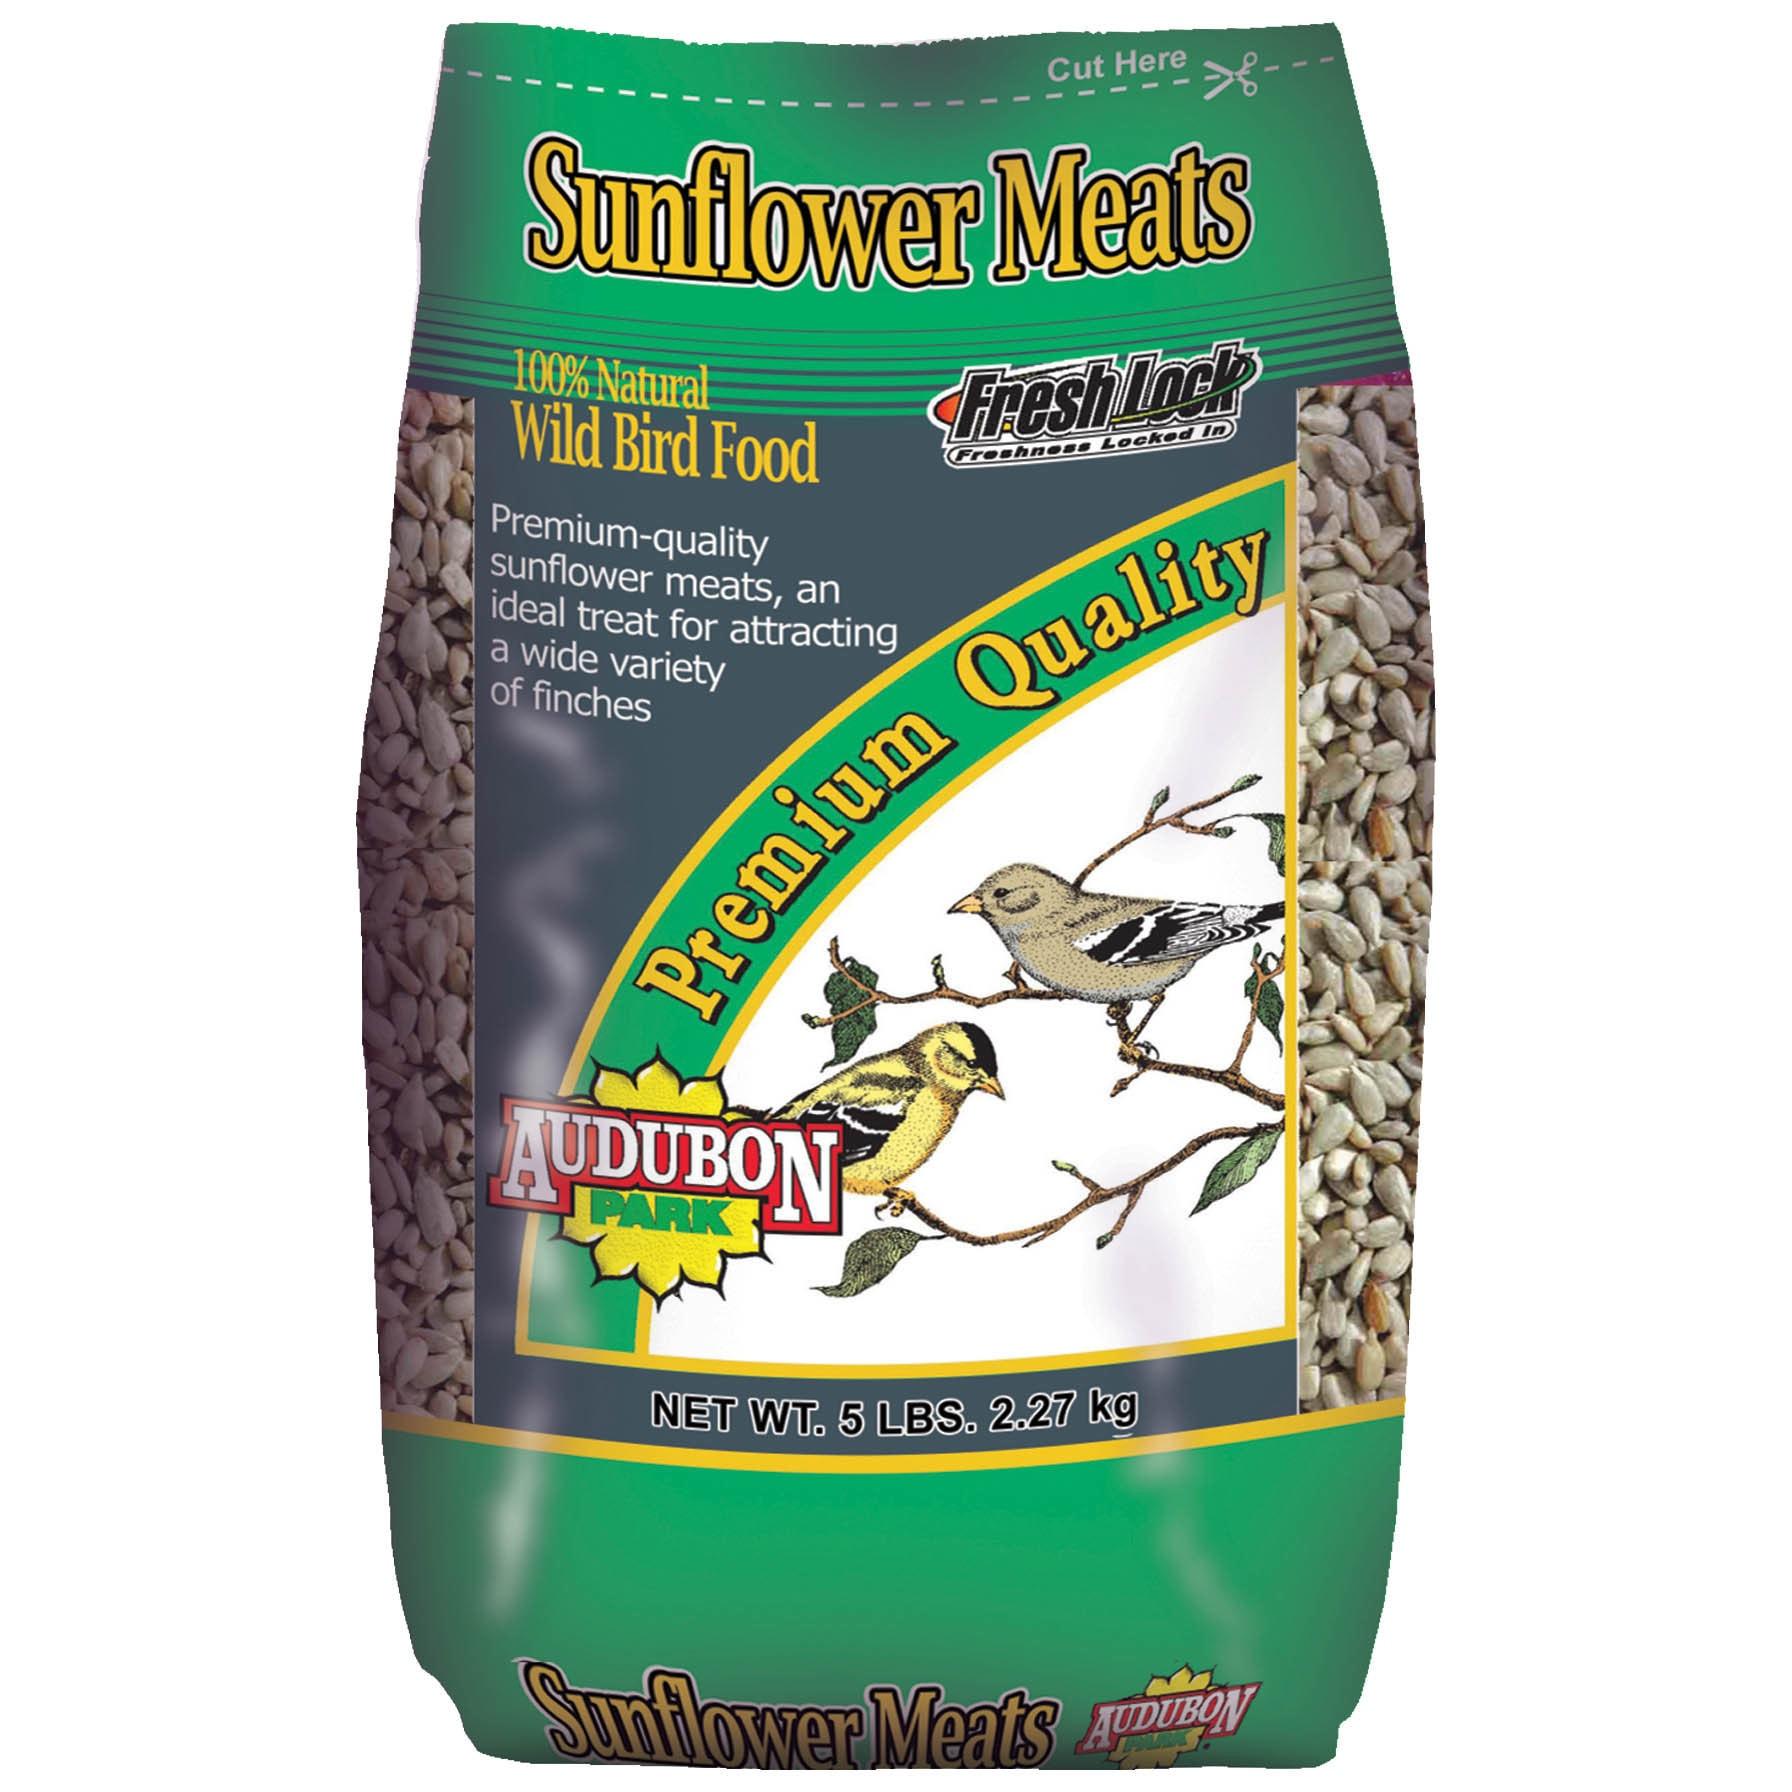 Audubon Park 5 Lb Sunflower Meats Wild Bird Food (5 LB)